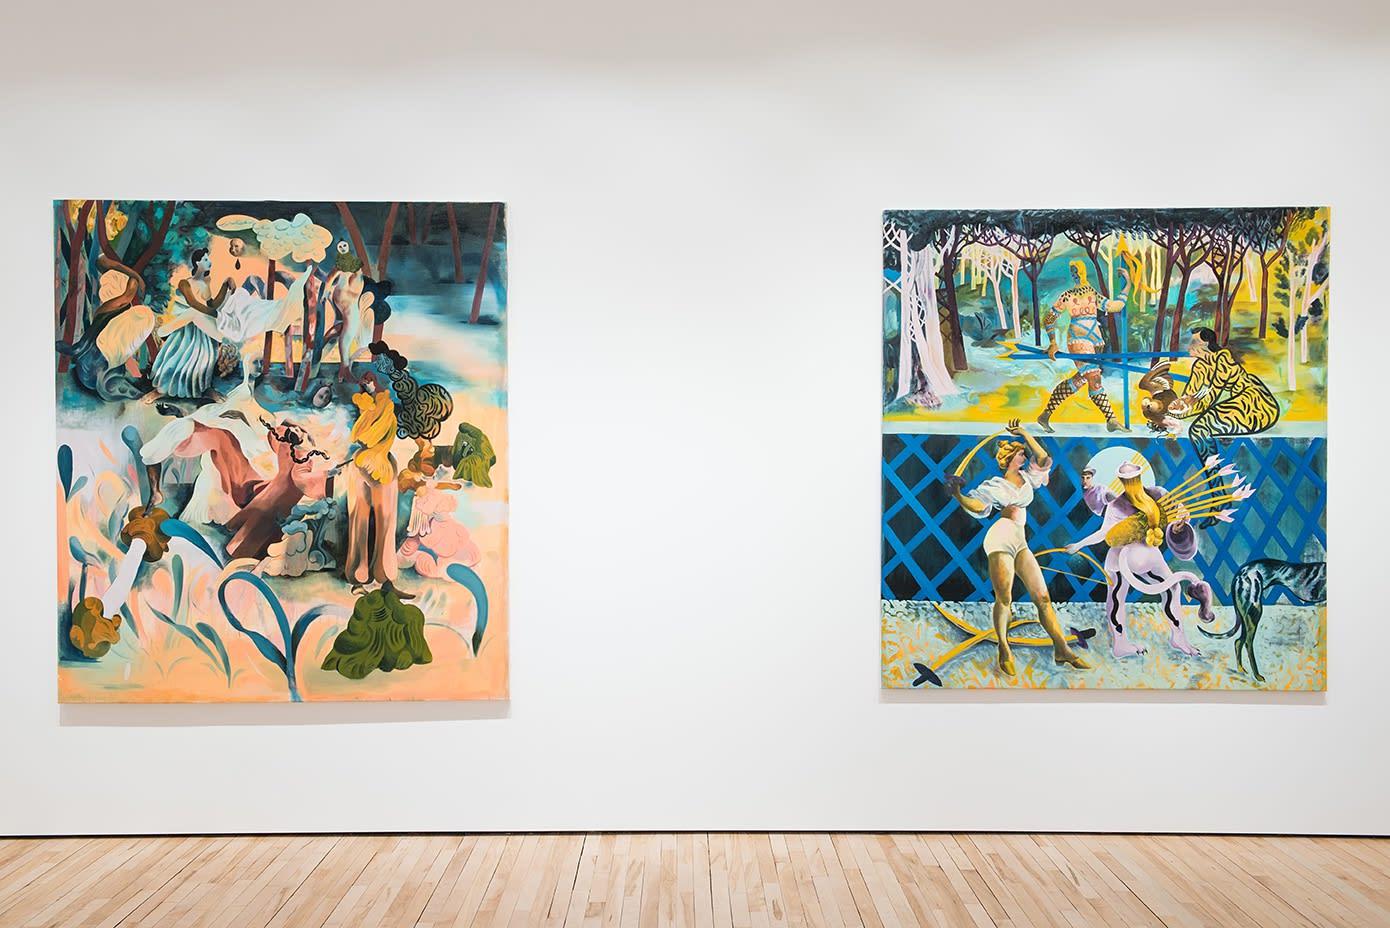 "<span class=""link fancybox-details-link""><a href=""/exhibitions/6/works/image85/"">View Detail Page</a></span><p>Jessie Makinson | Skimpy Flirt | 2017 | 190 x 170cms</p><p>Jessie Makinson | Fluffy Whistle | 2017 | 183 x 168cms</p><p>(from left)</p>"